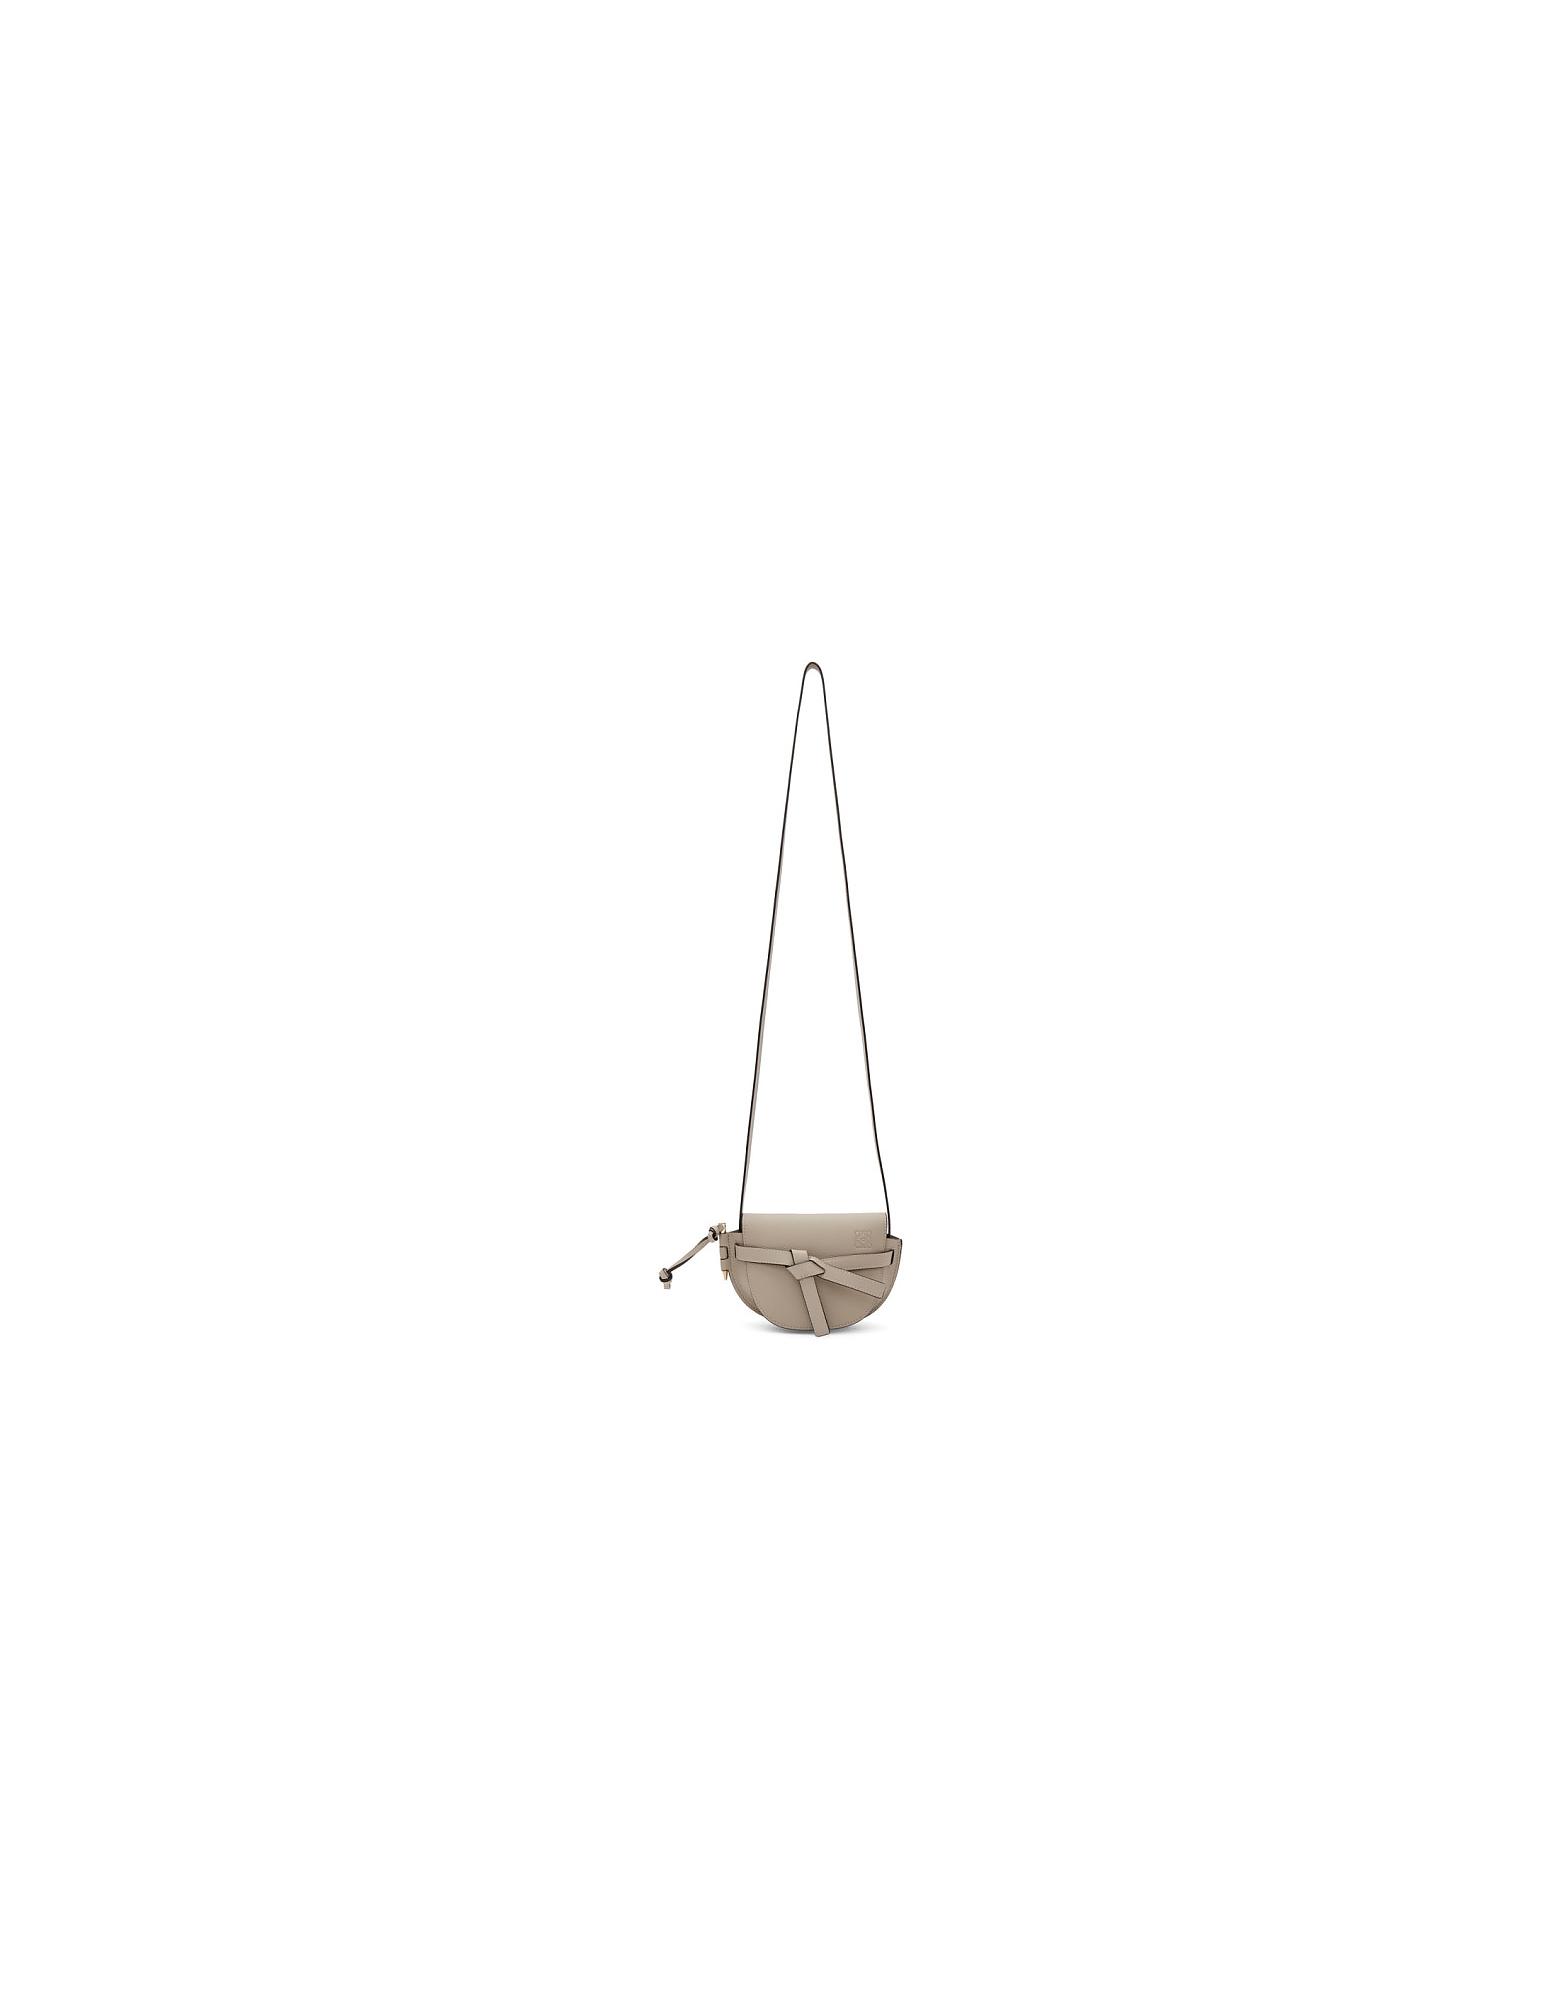 Loewe Designer Handbags, Beige Mini Gate Bag